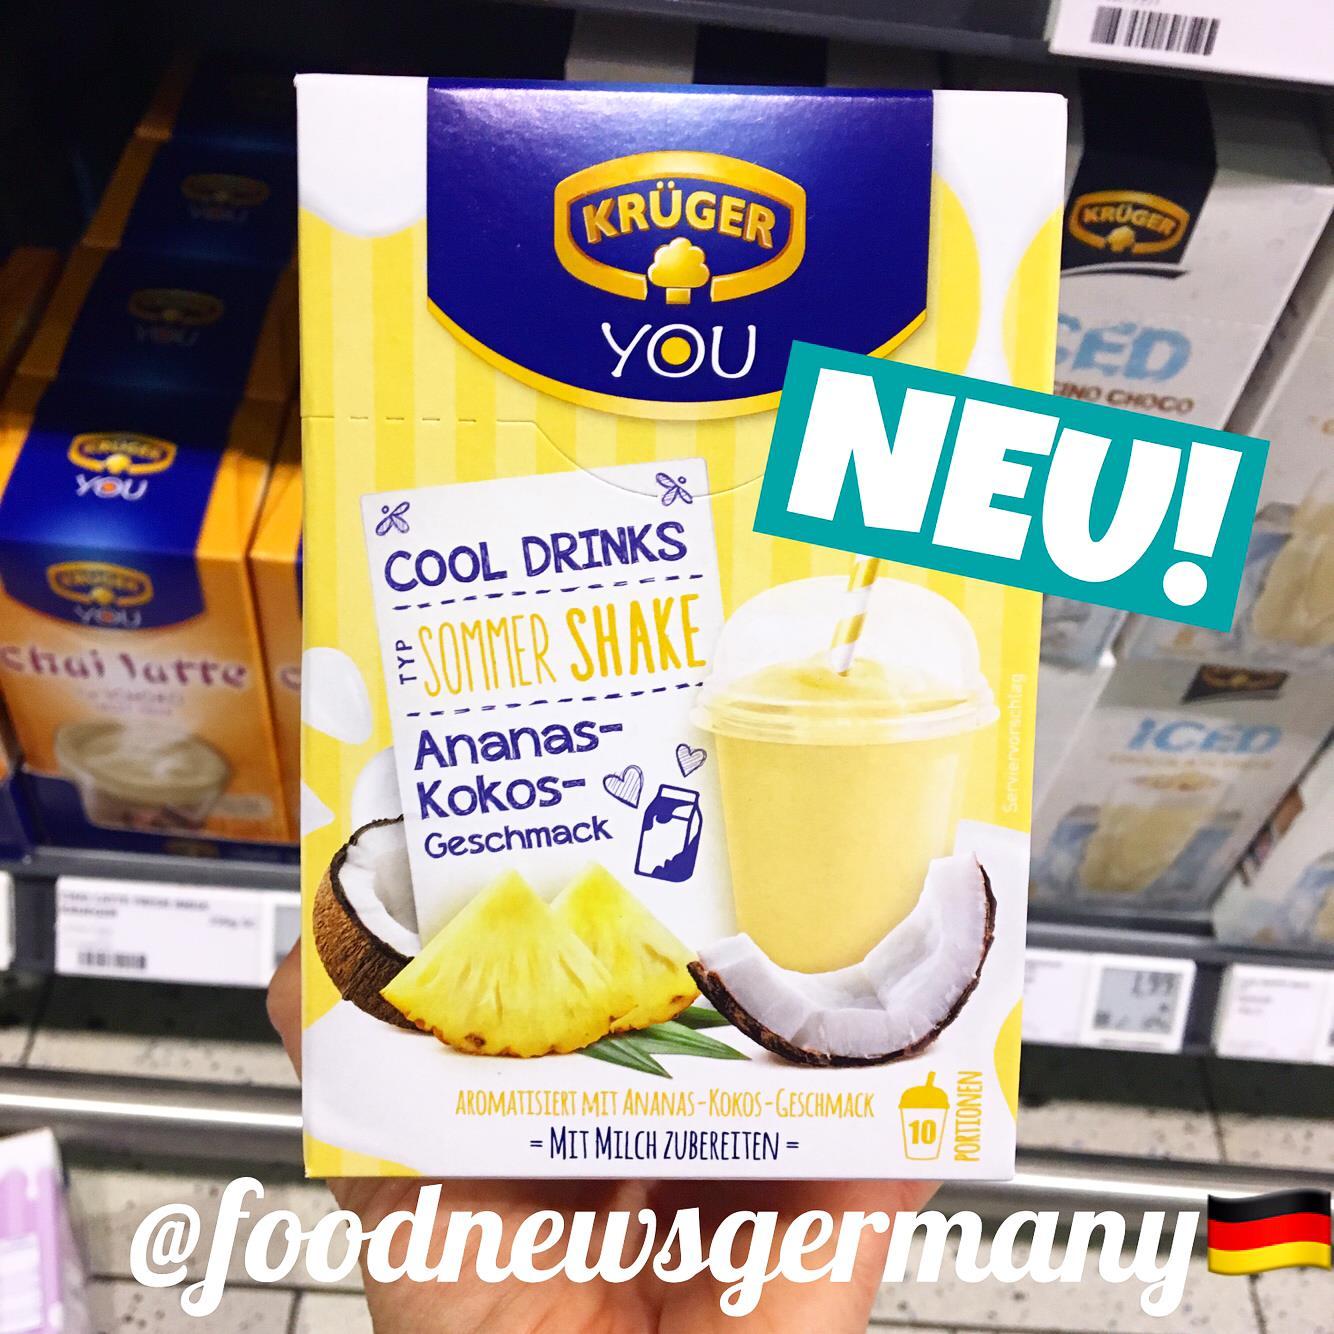 Krüger You Cool Drinks Ananas-Kokos Geschmack